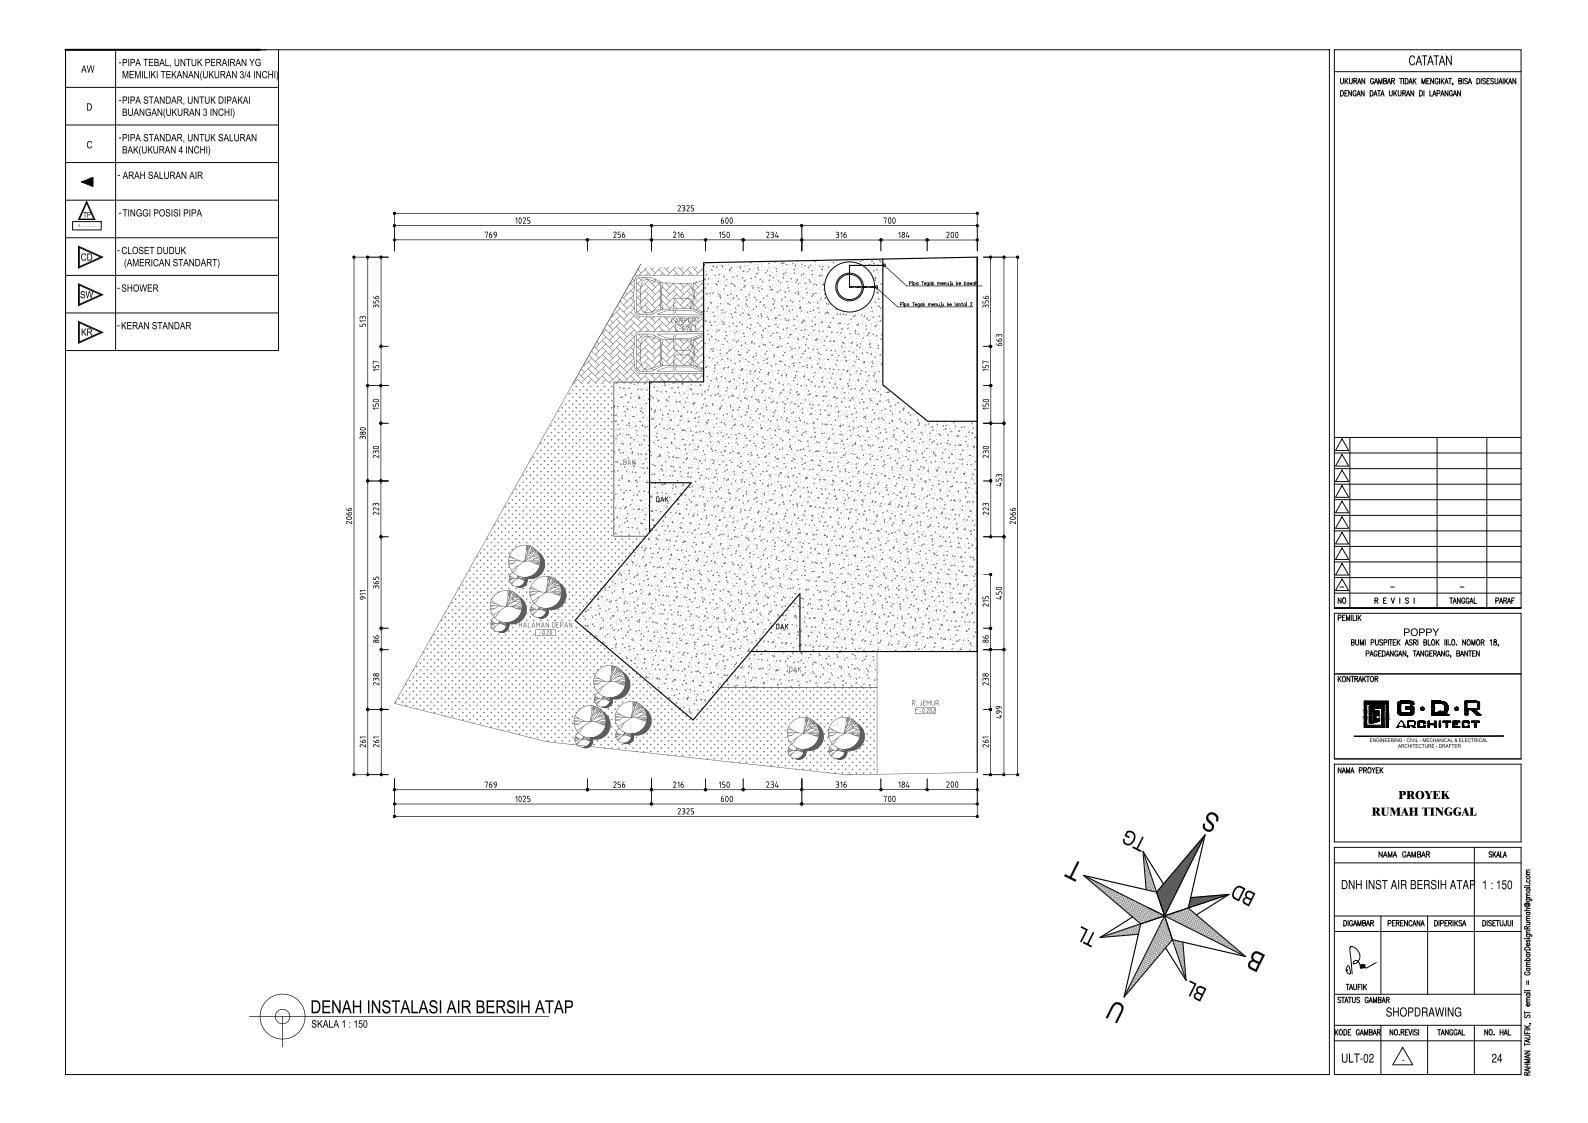 Jasa Desain Rumah Contoh Paket Gambar Kerja 24 DENAH INSTALASI AIR BERSIH ATAP